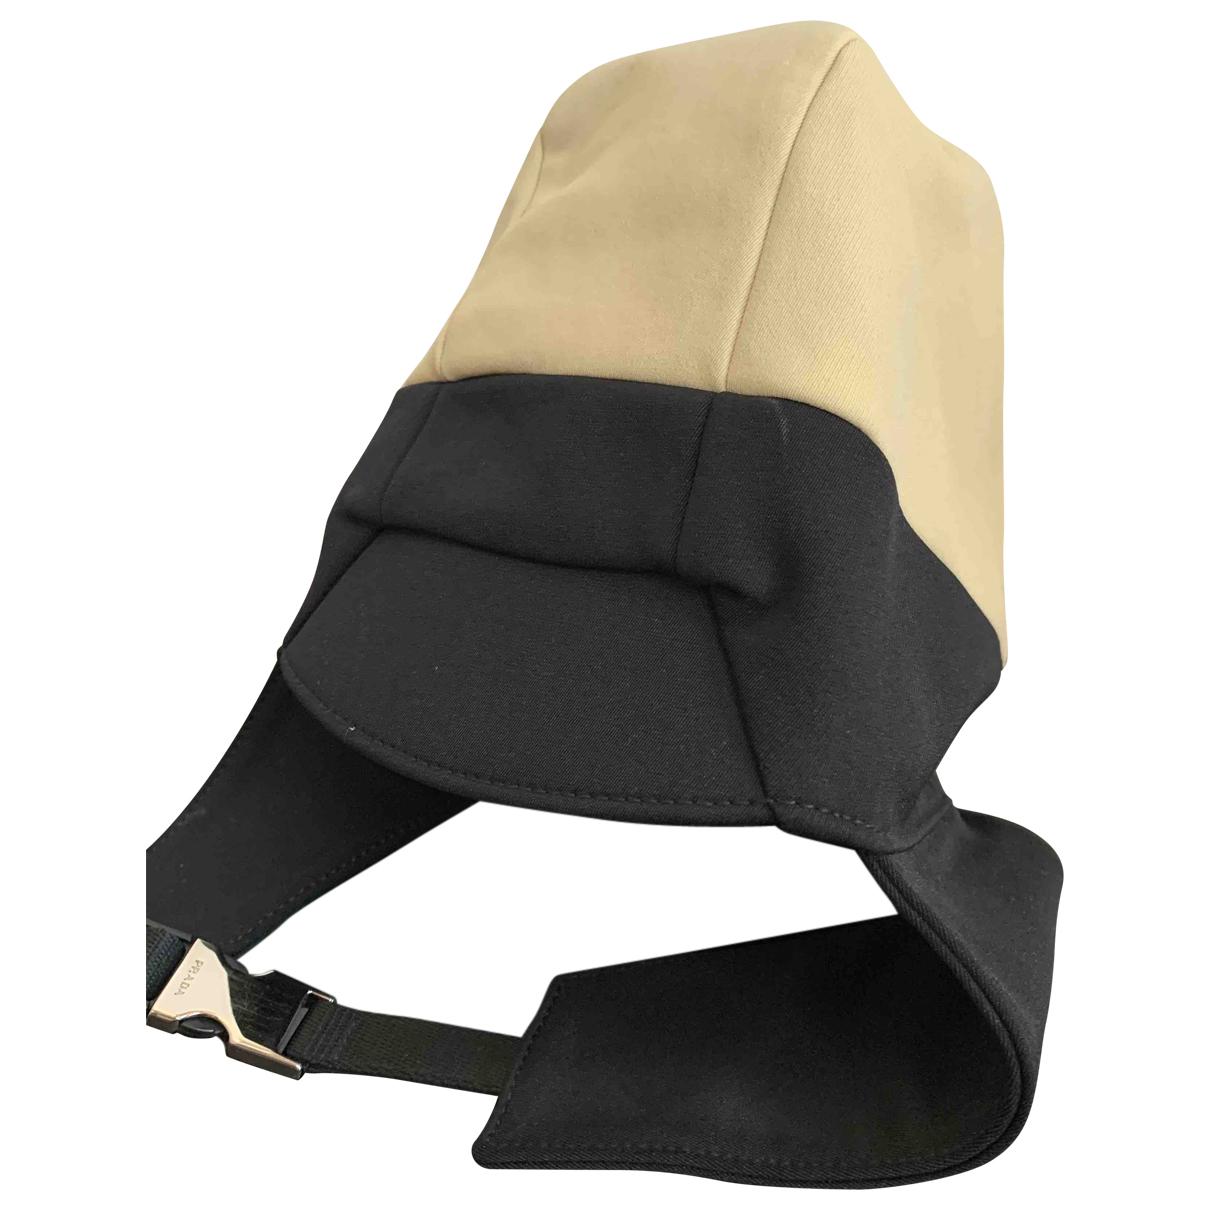 Prada \N Beige hat & pull on hat for Men M International